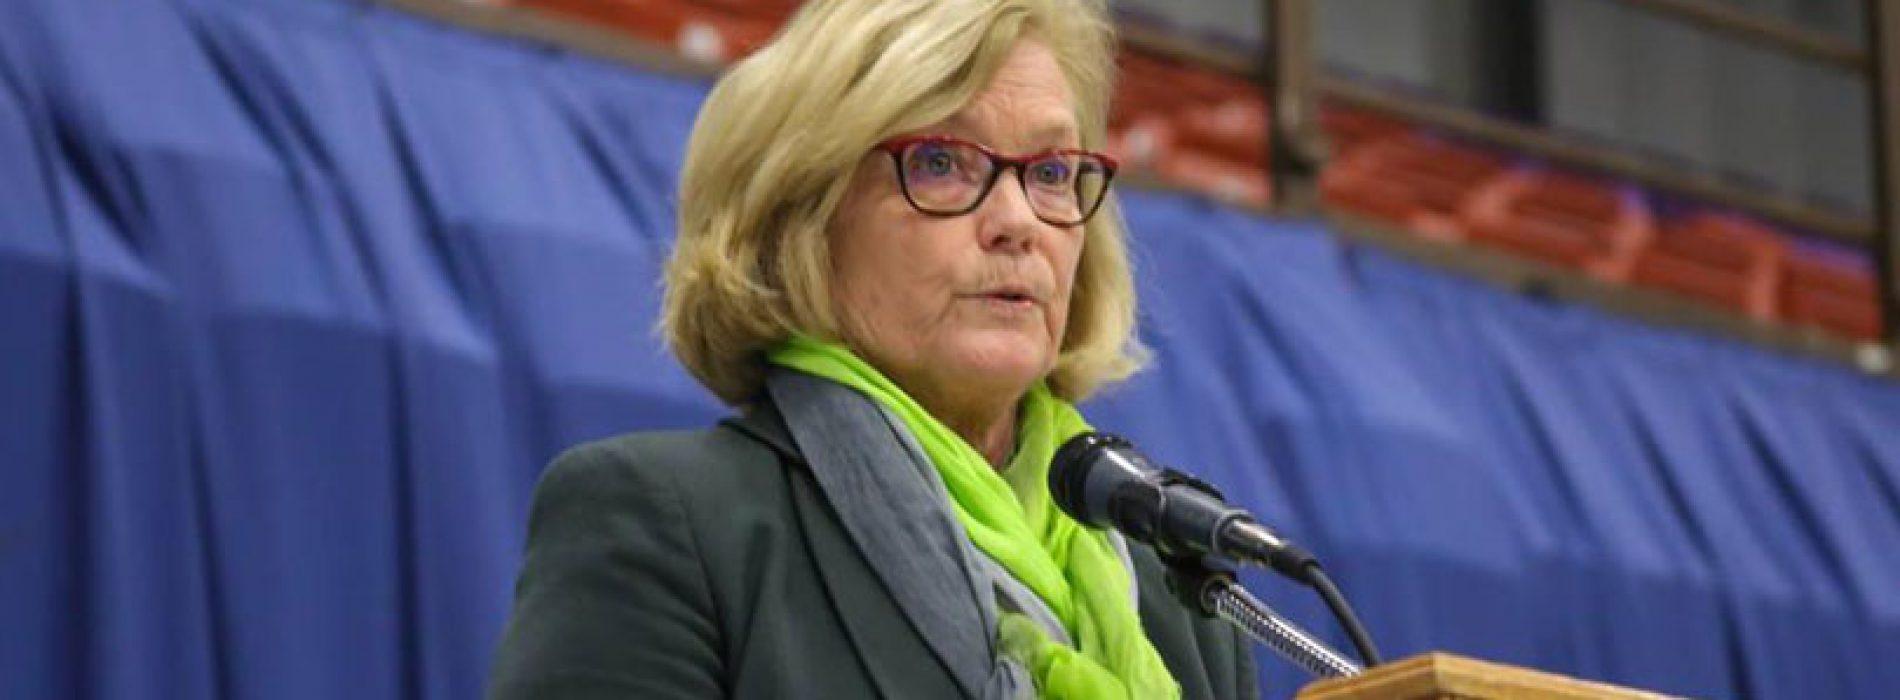 Rep. Pingree calls out WGME's 'pro-Trump propaganda'